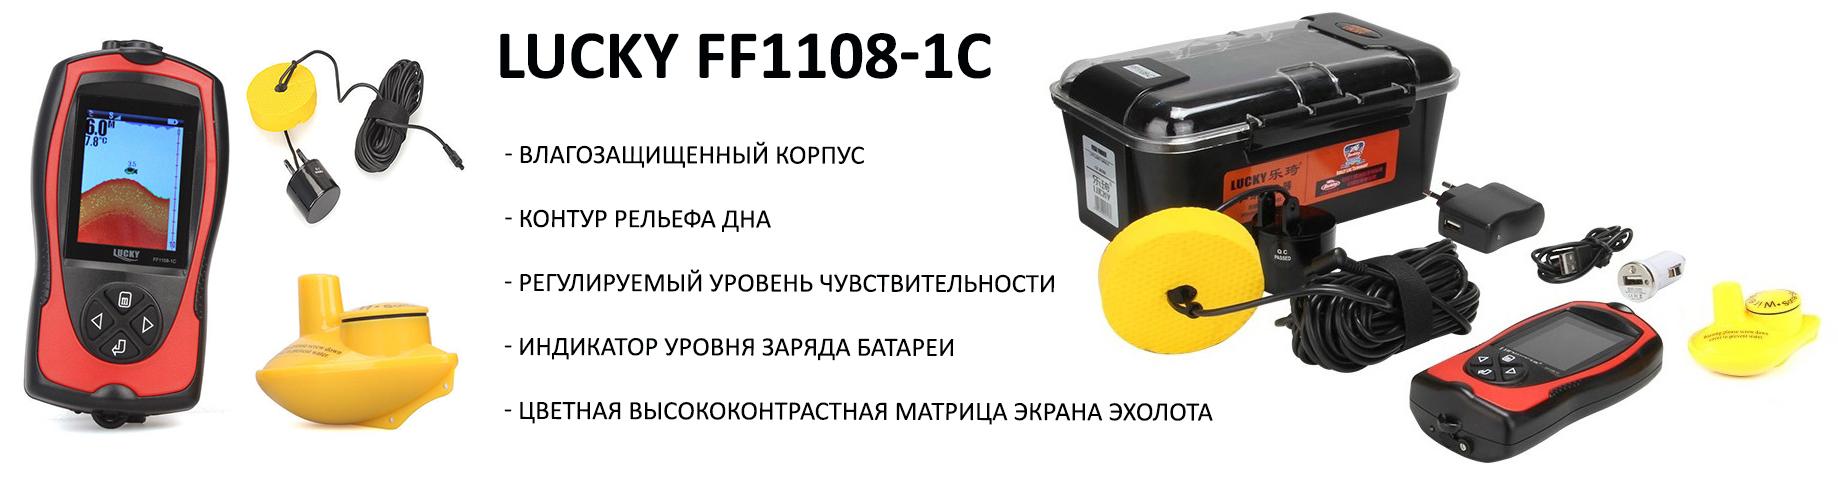 Эхолот Lucky FF1108-1C